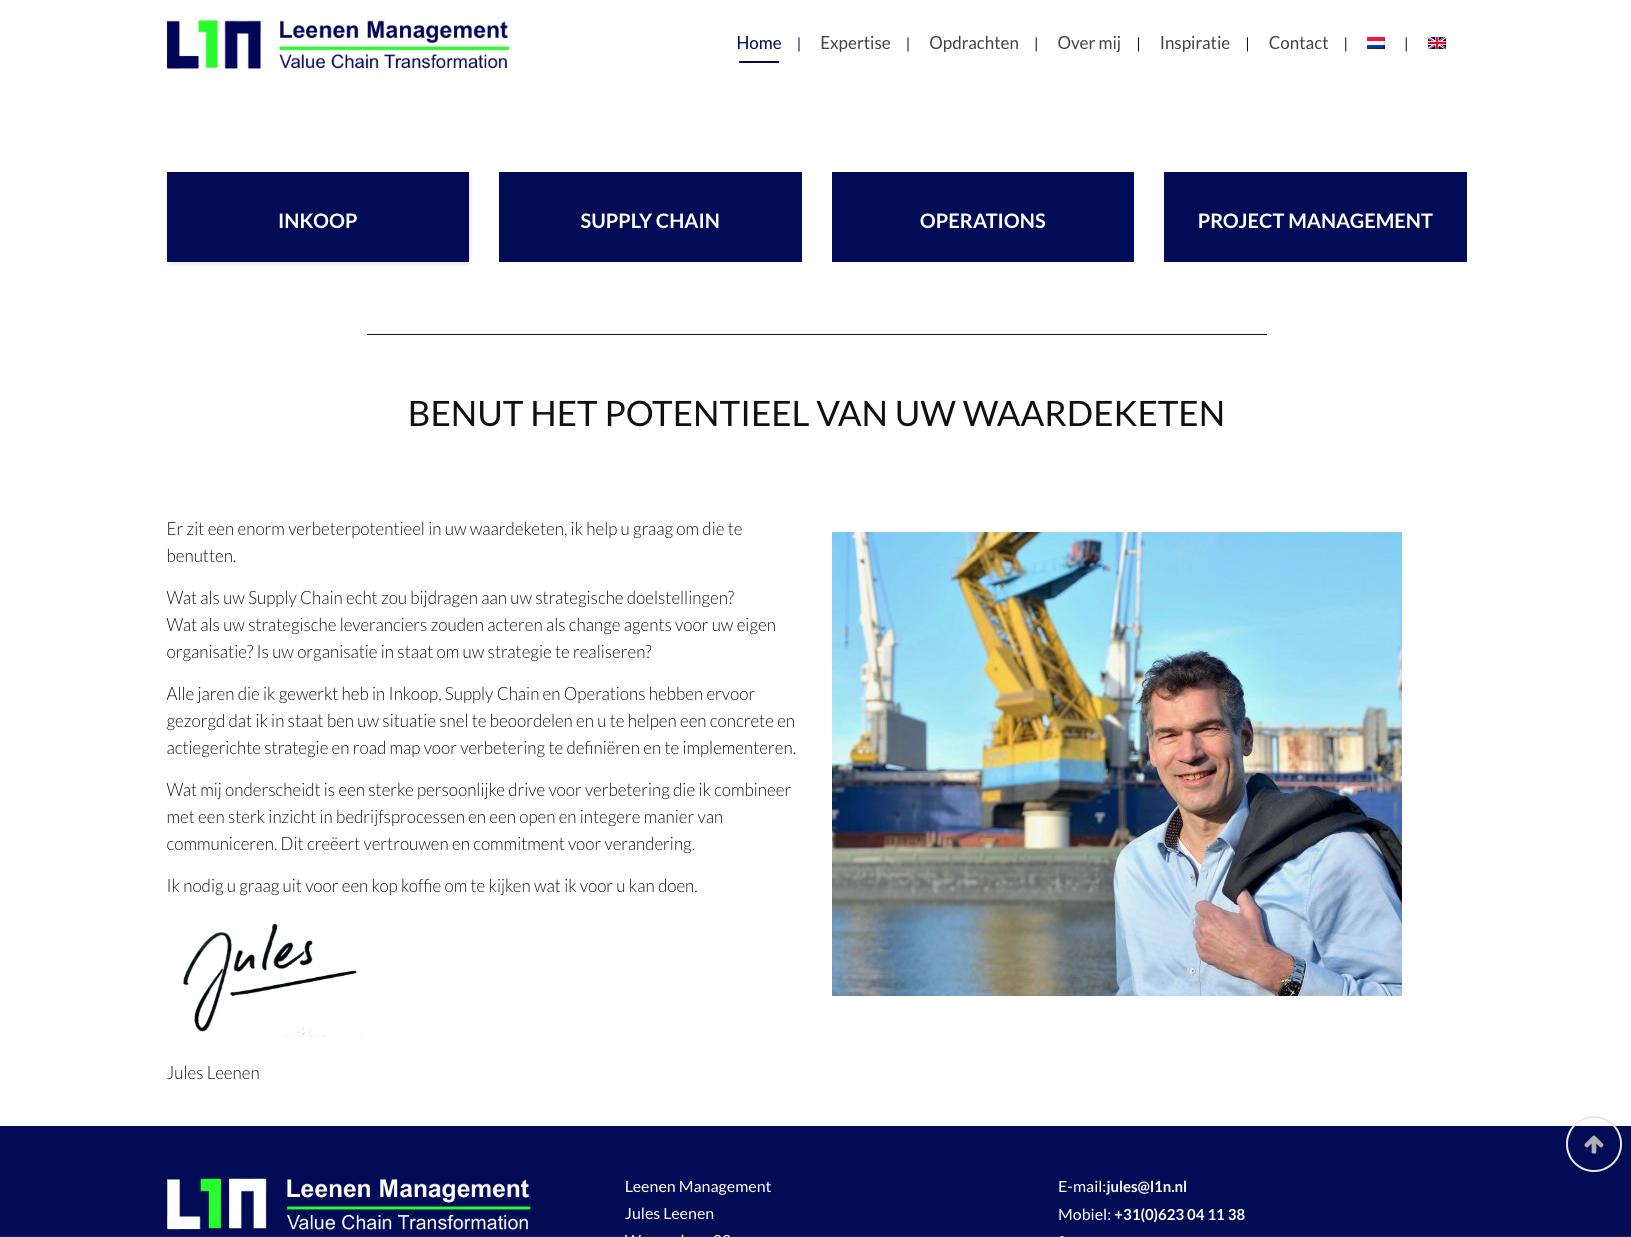 WebMagix-portfolio-Leenen-Management